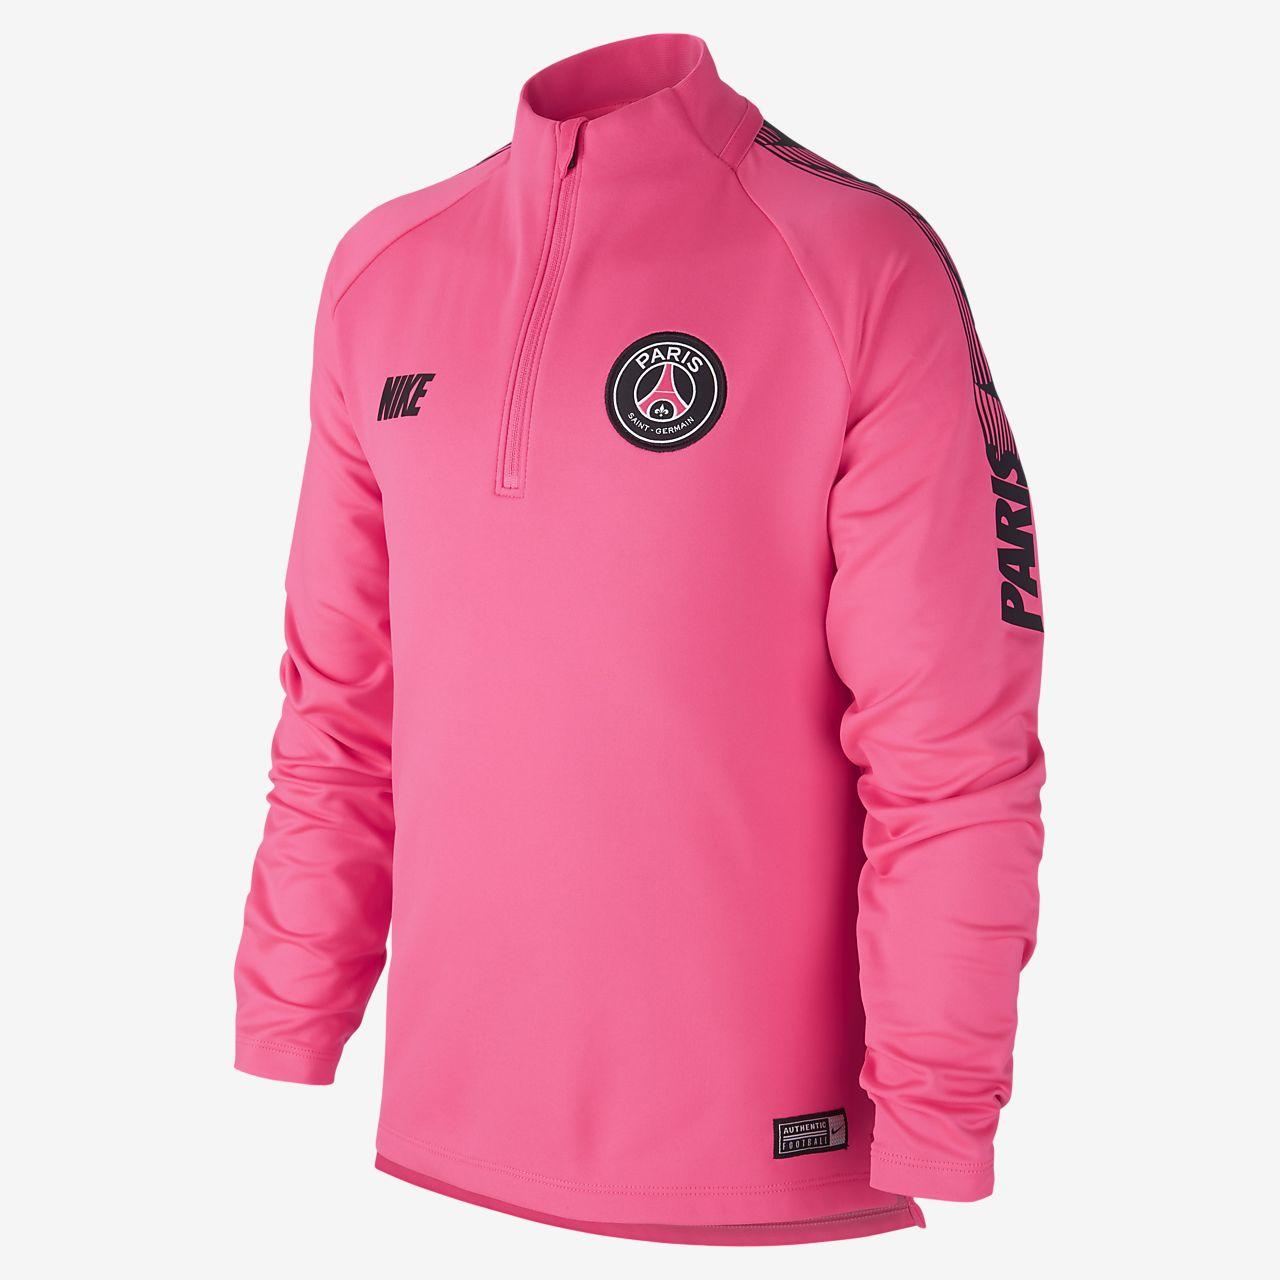 Футболка для футбольного тренинга для школьников Nike Dri-FIT Paris Saint-Germain Squad